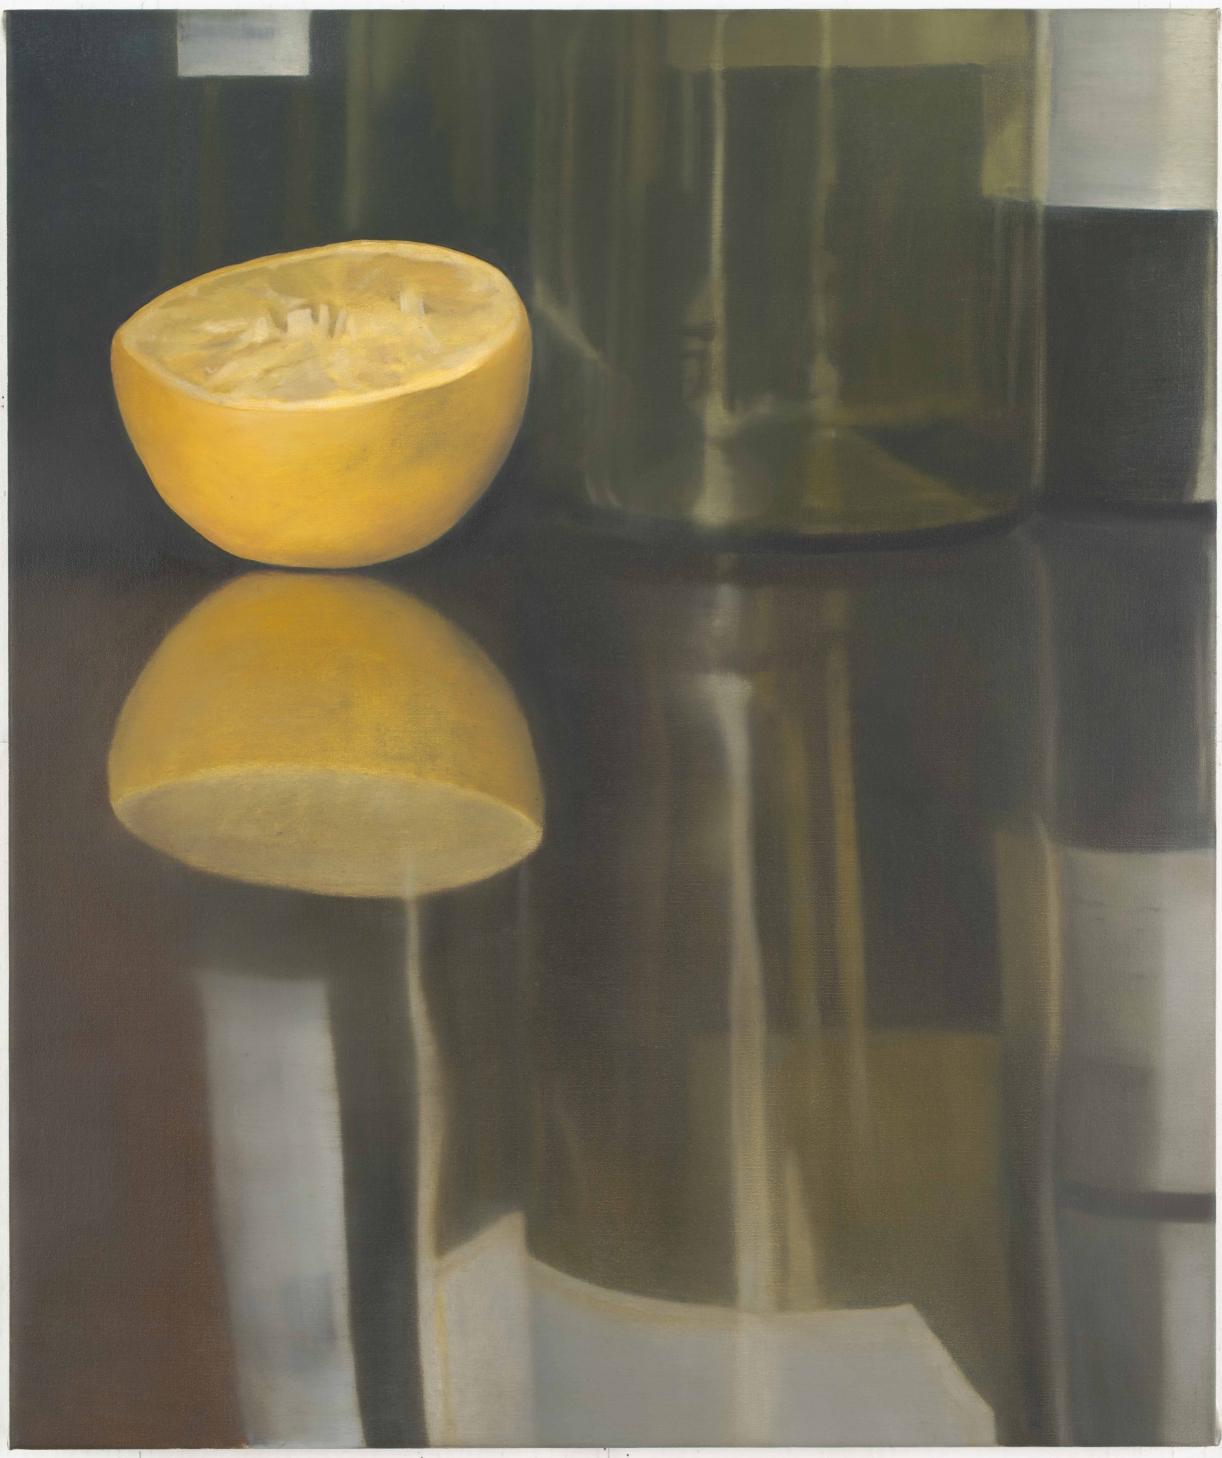 Bert de Beul, Untitled, 2015, Oil on canvas